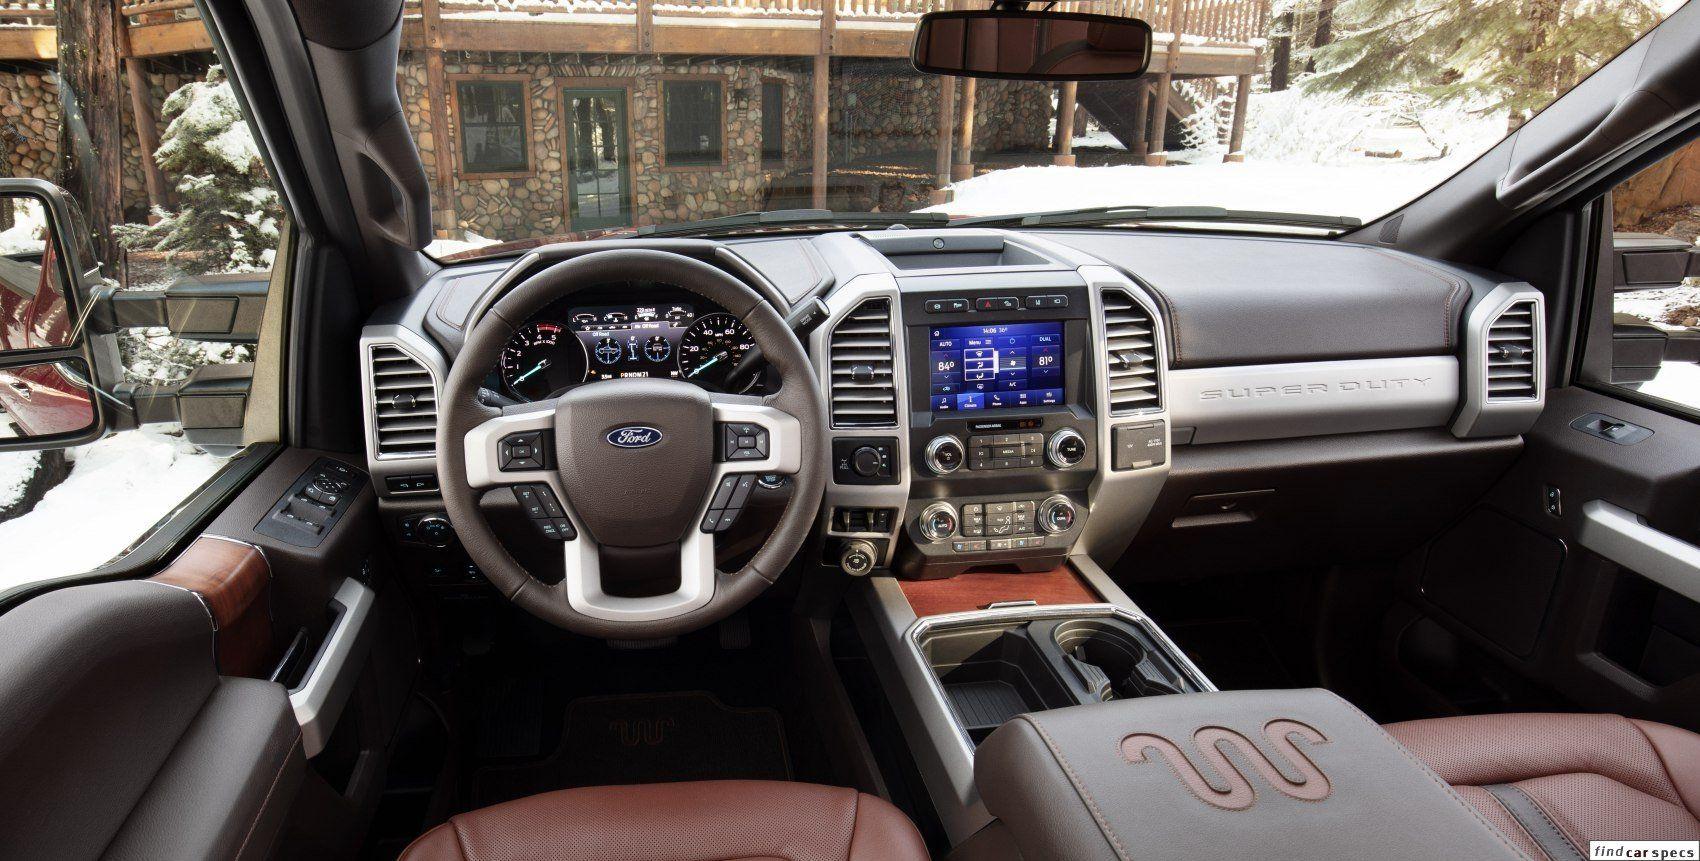 Ford F250 F 250 Super Duty Iv Crew Cab Facelift 2020 6 7d V8 475 Hp 4x4 Automatic Swb Diesel 2020 F 250 Sup F250 Ford Super Duty Ford F250